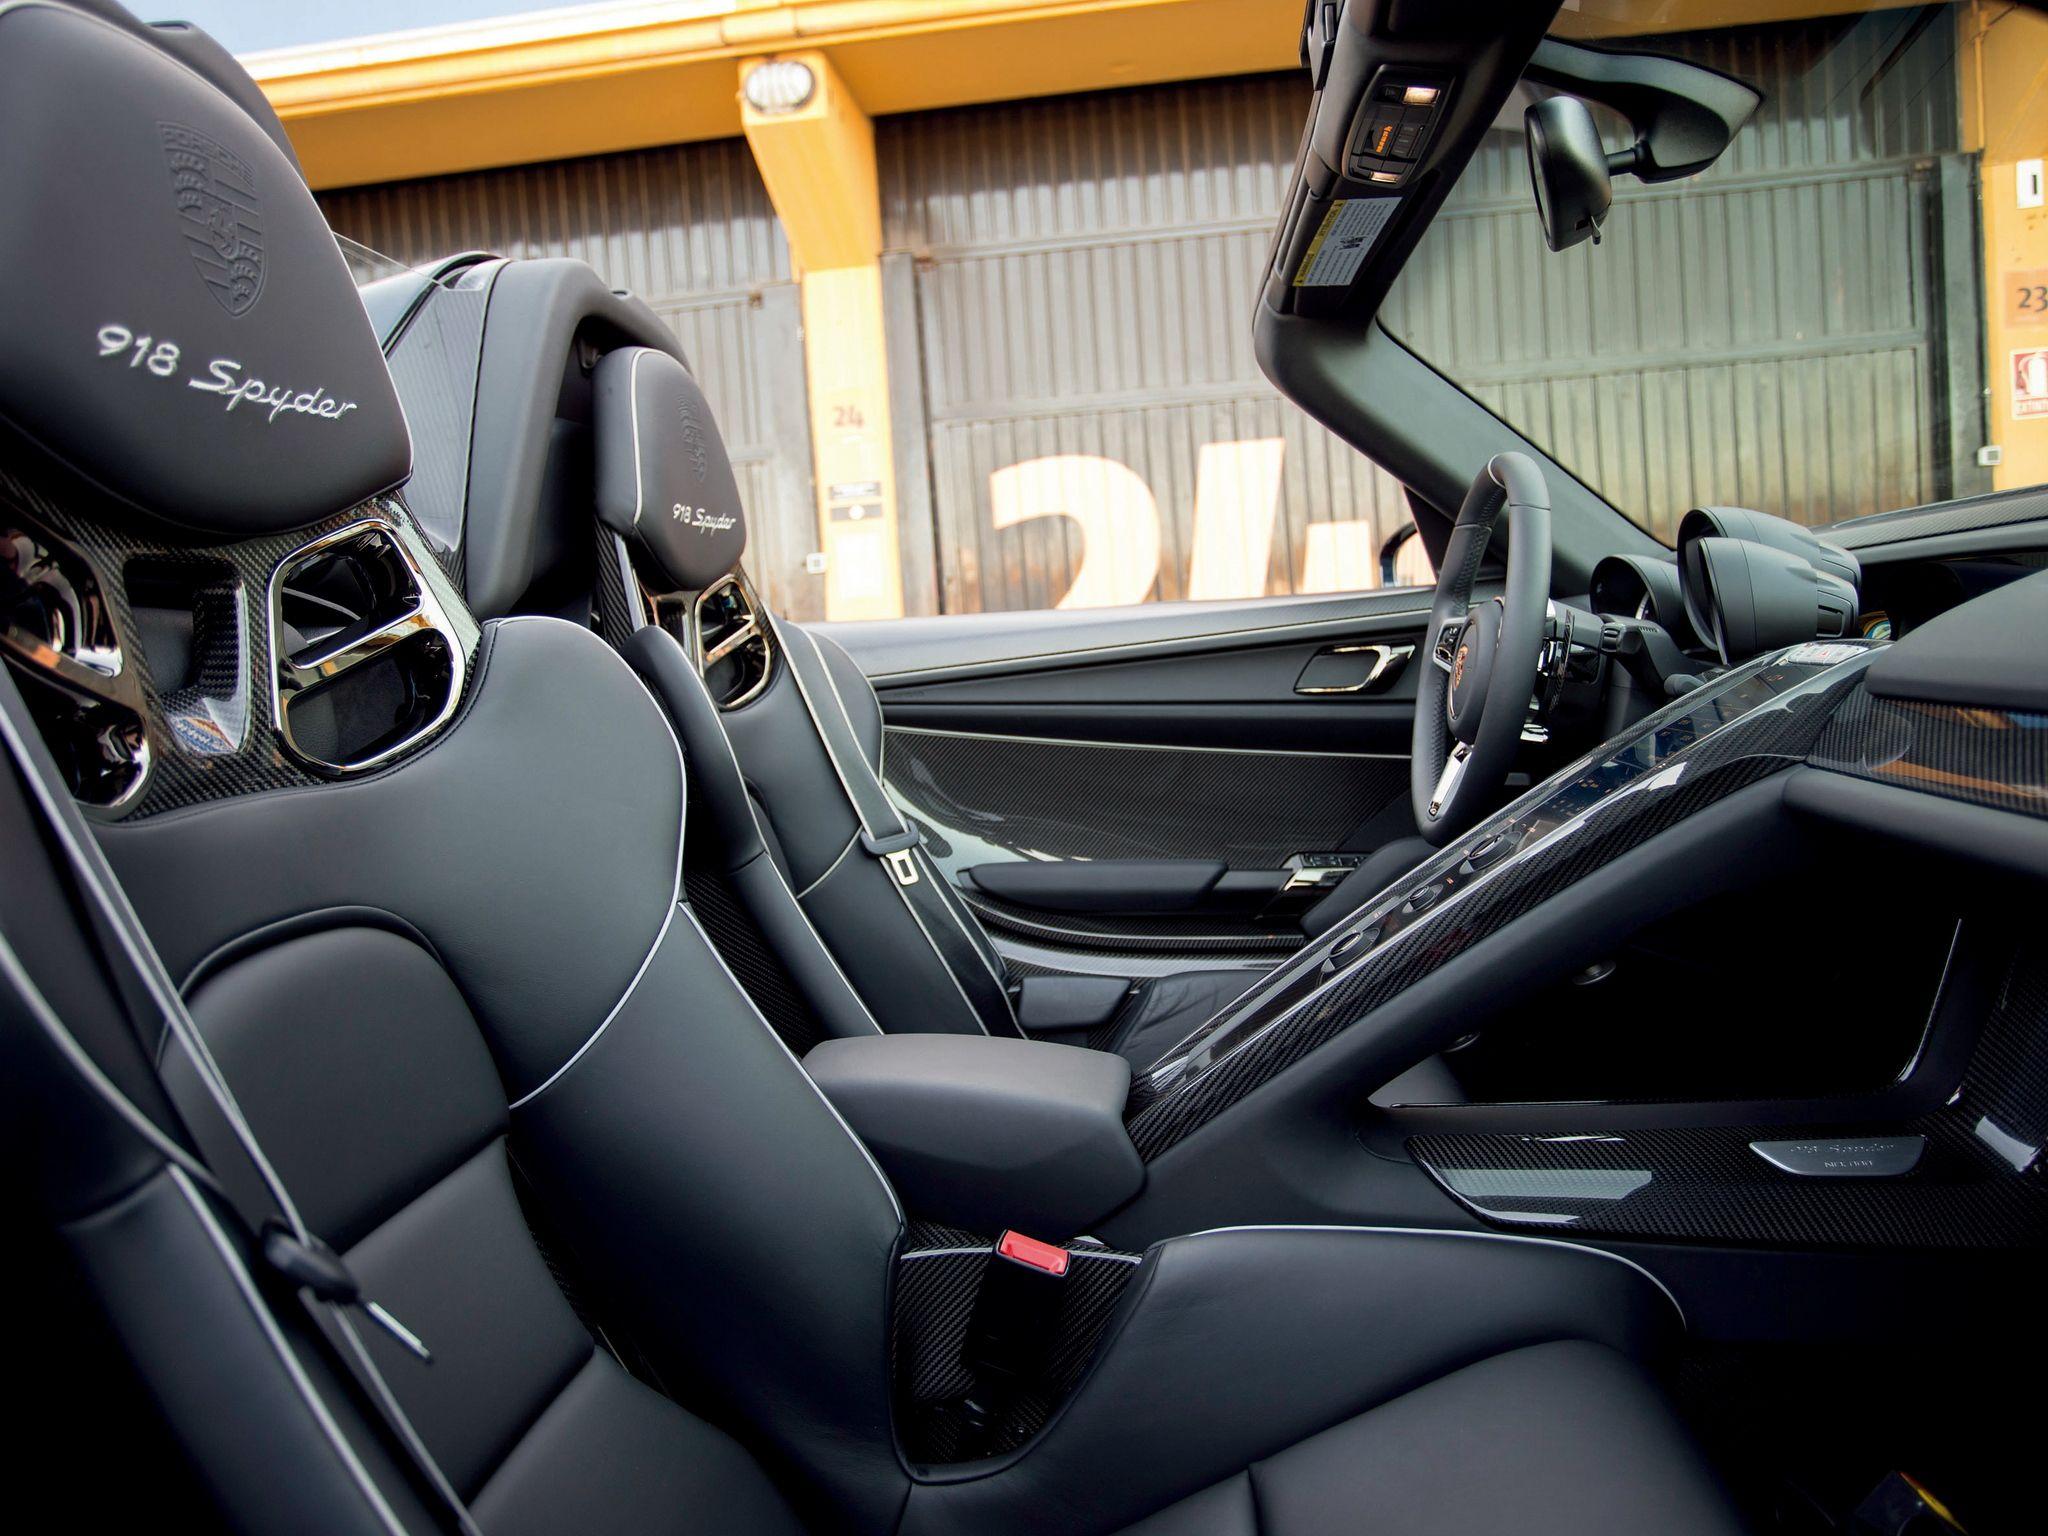 Charming 2014 Porsche 918 Spyder Interior   Http://carwallpaper.org/2014